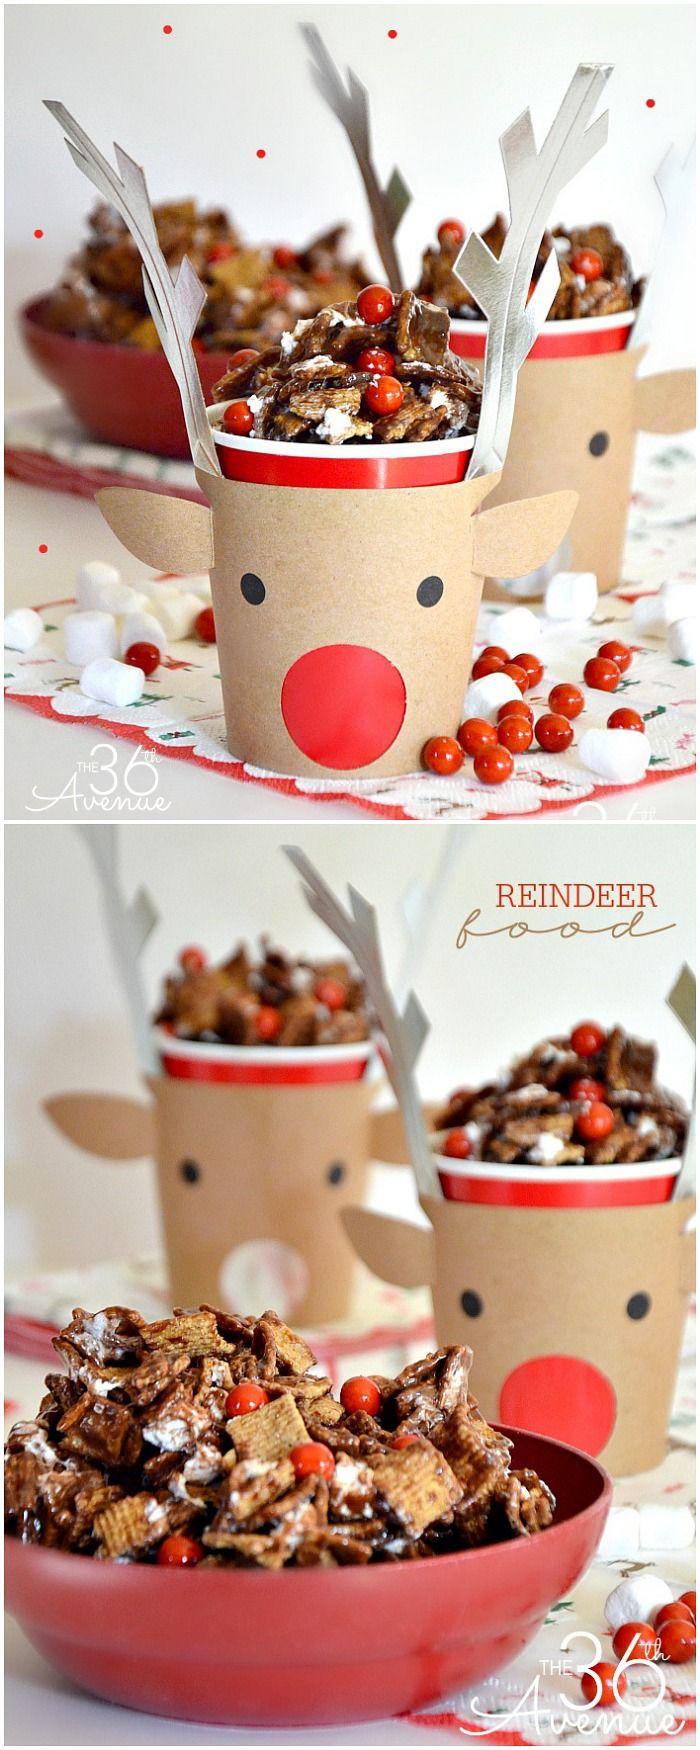 Christmas Recipe - Reindeer Food for humans... Yum!